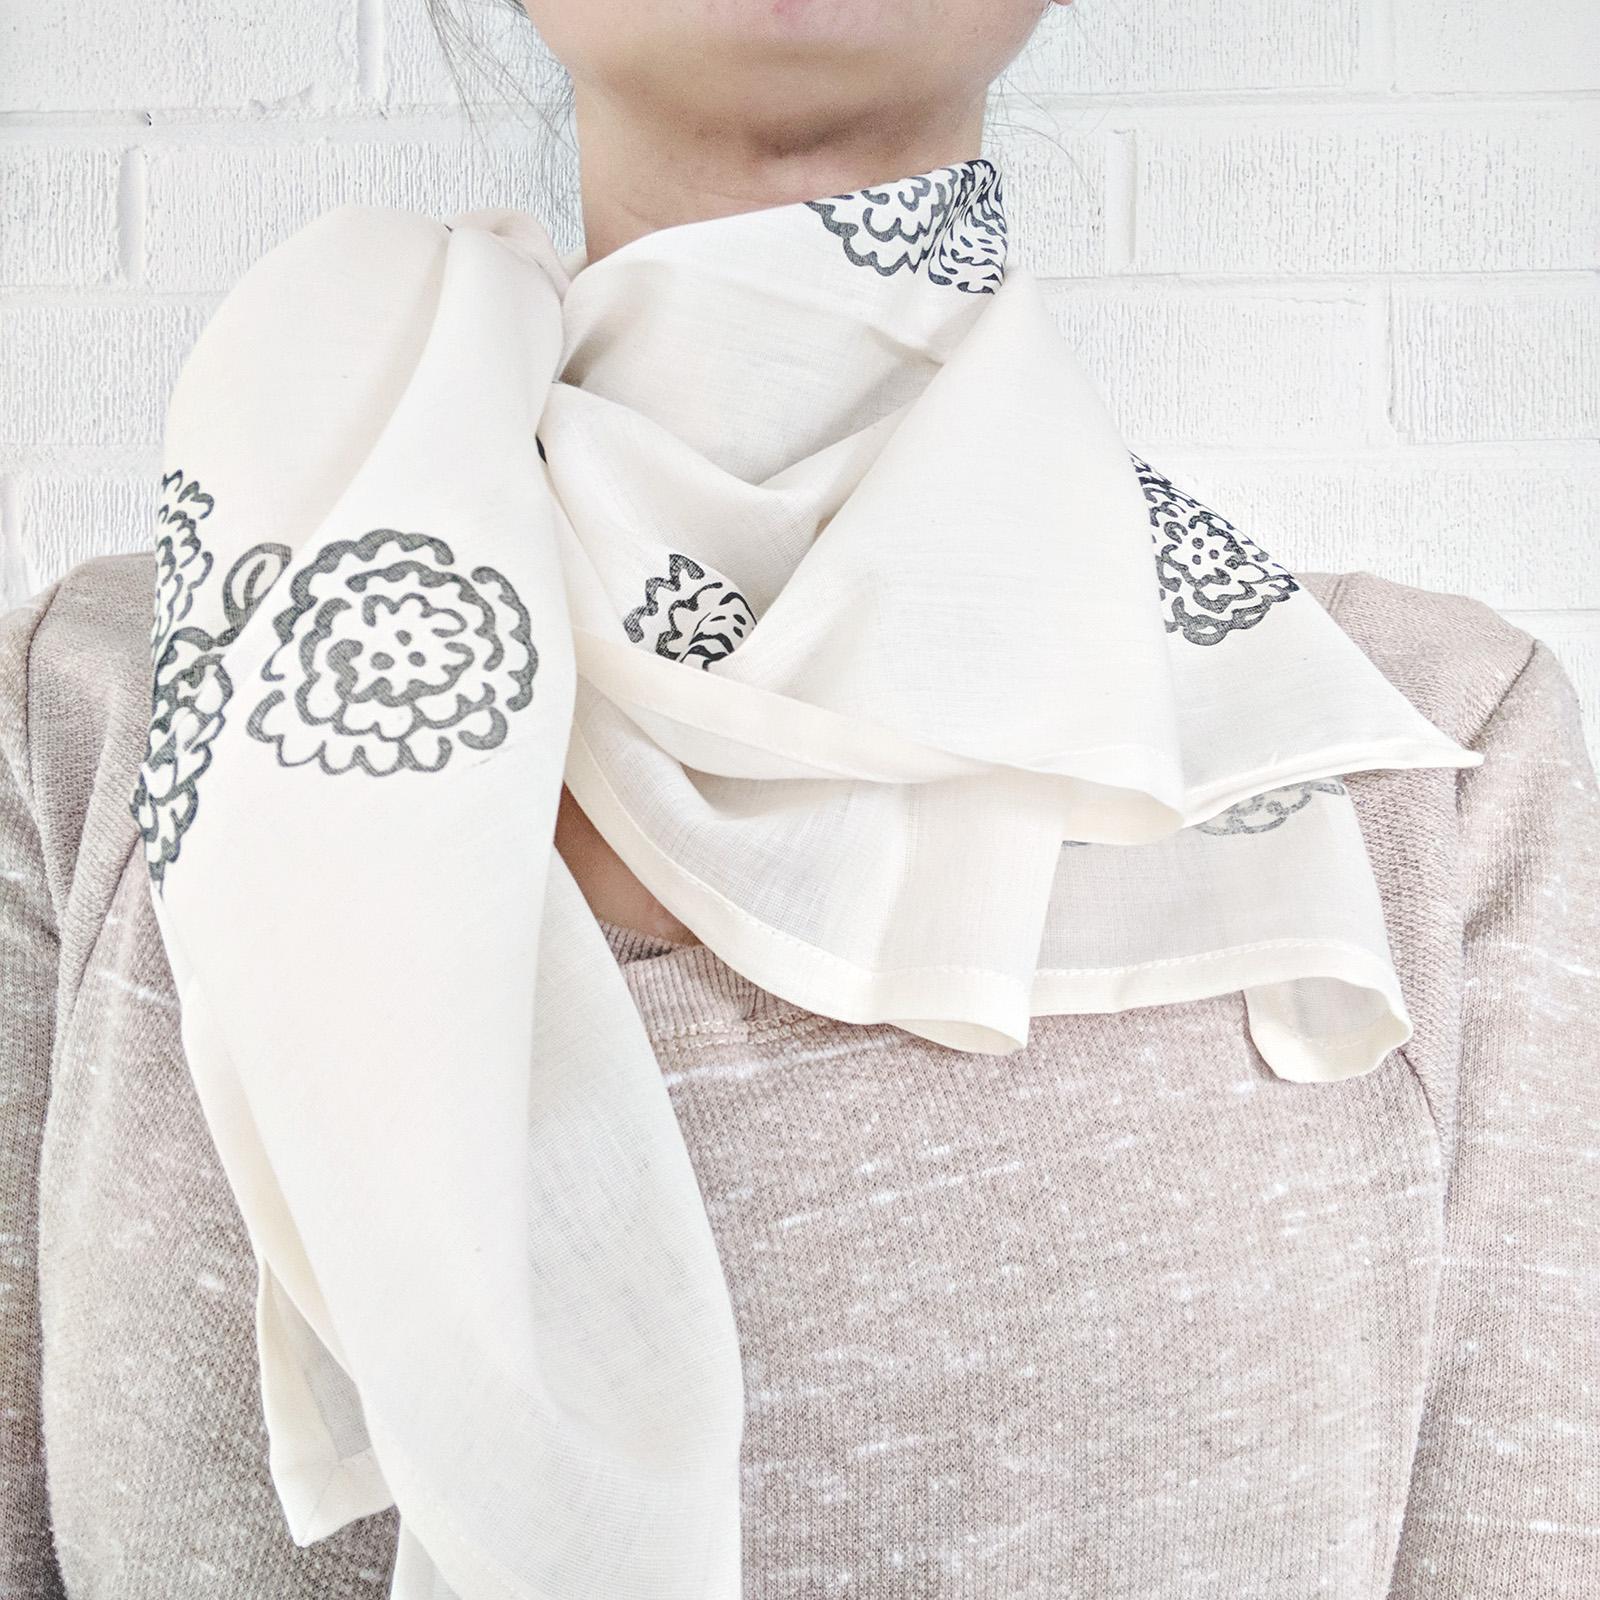 Garden Party Hand-Stamped Blanket Scarf